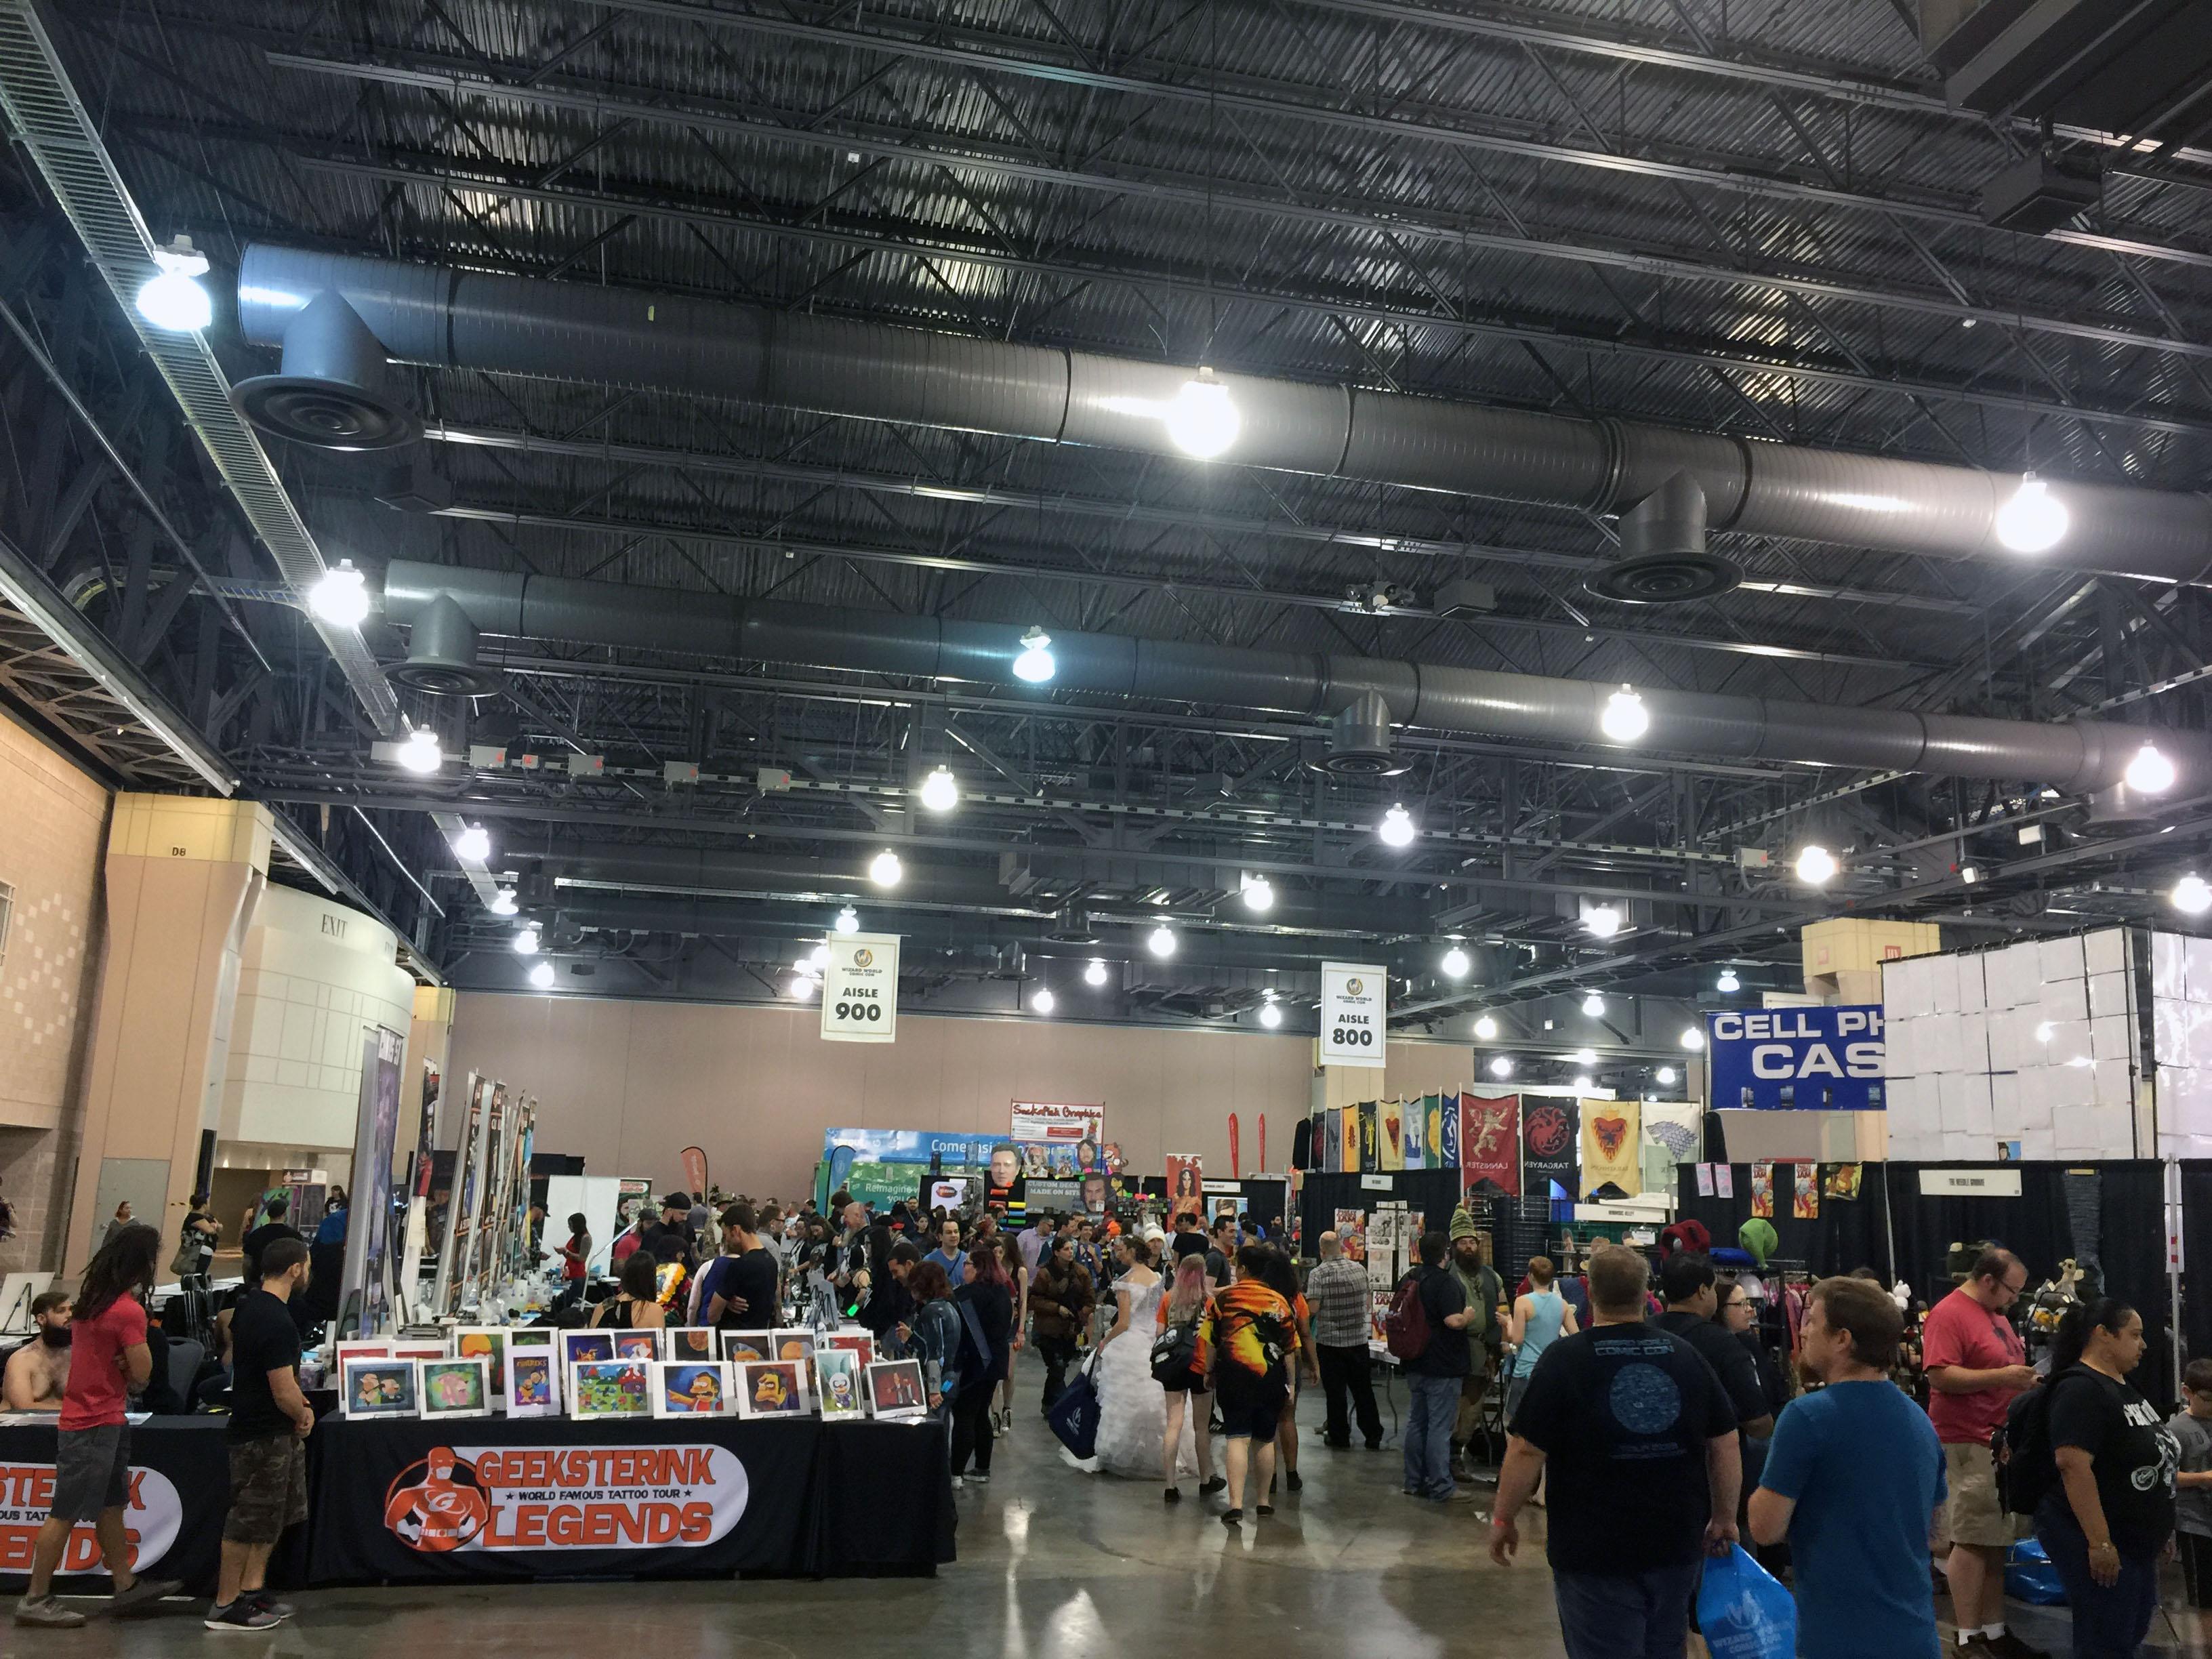 The main show floor was impressive.